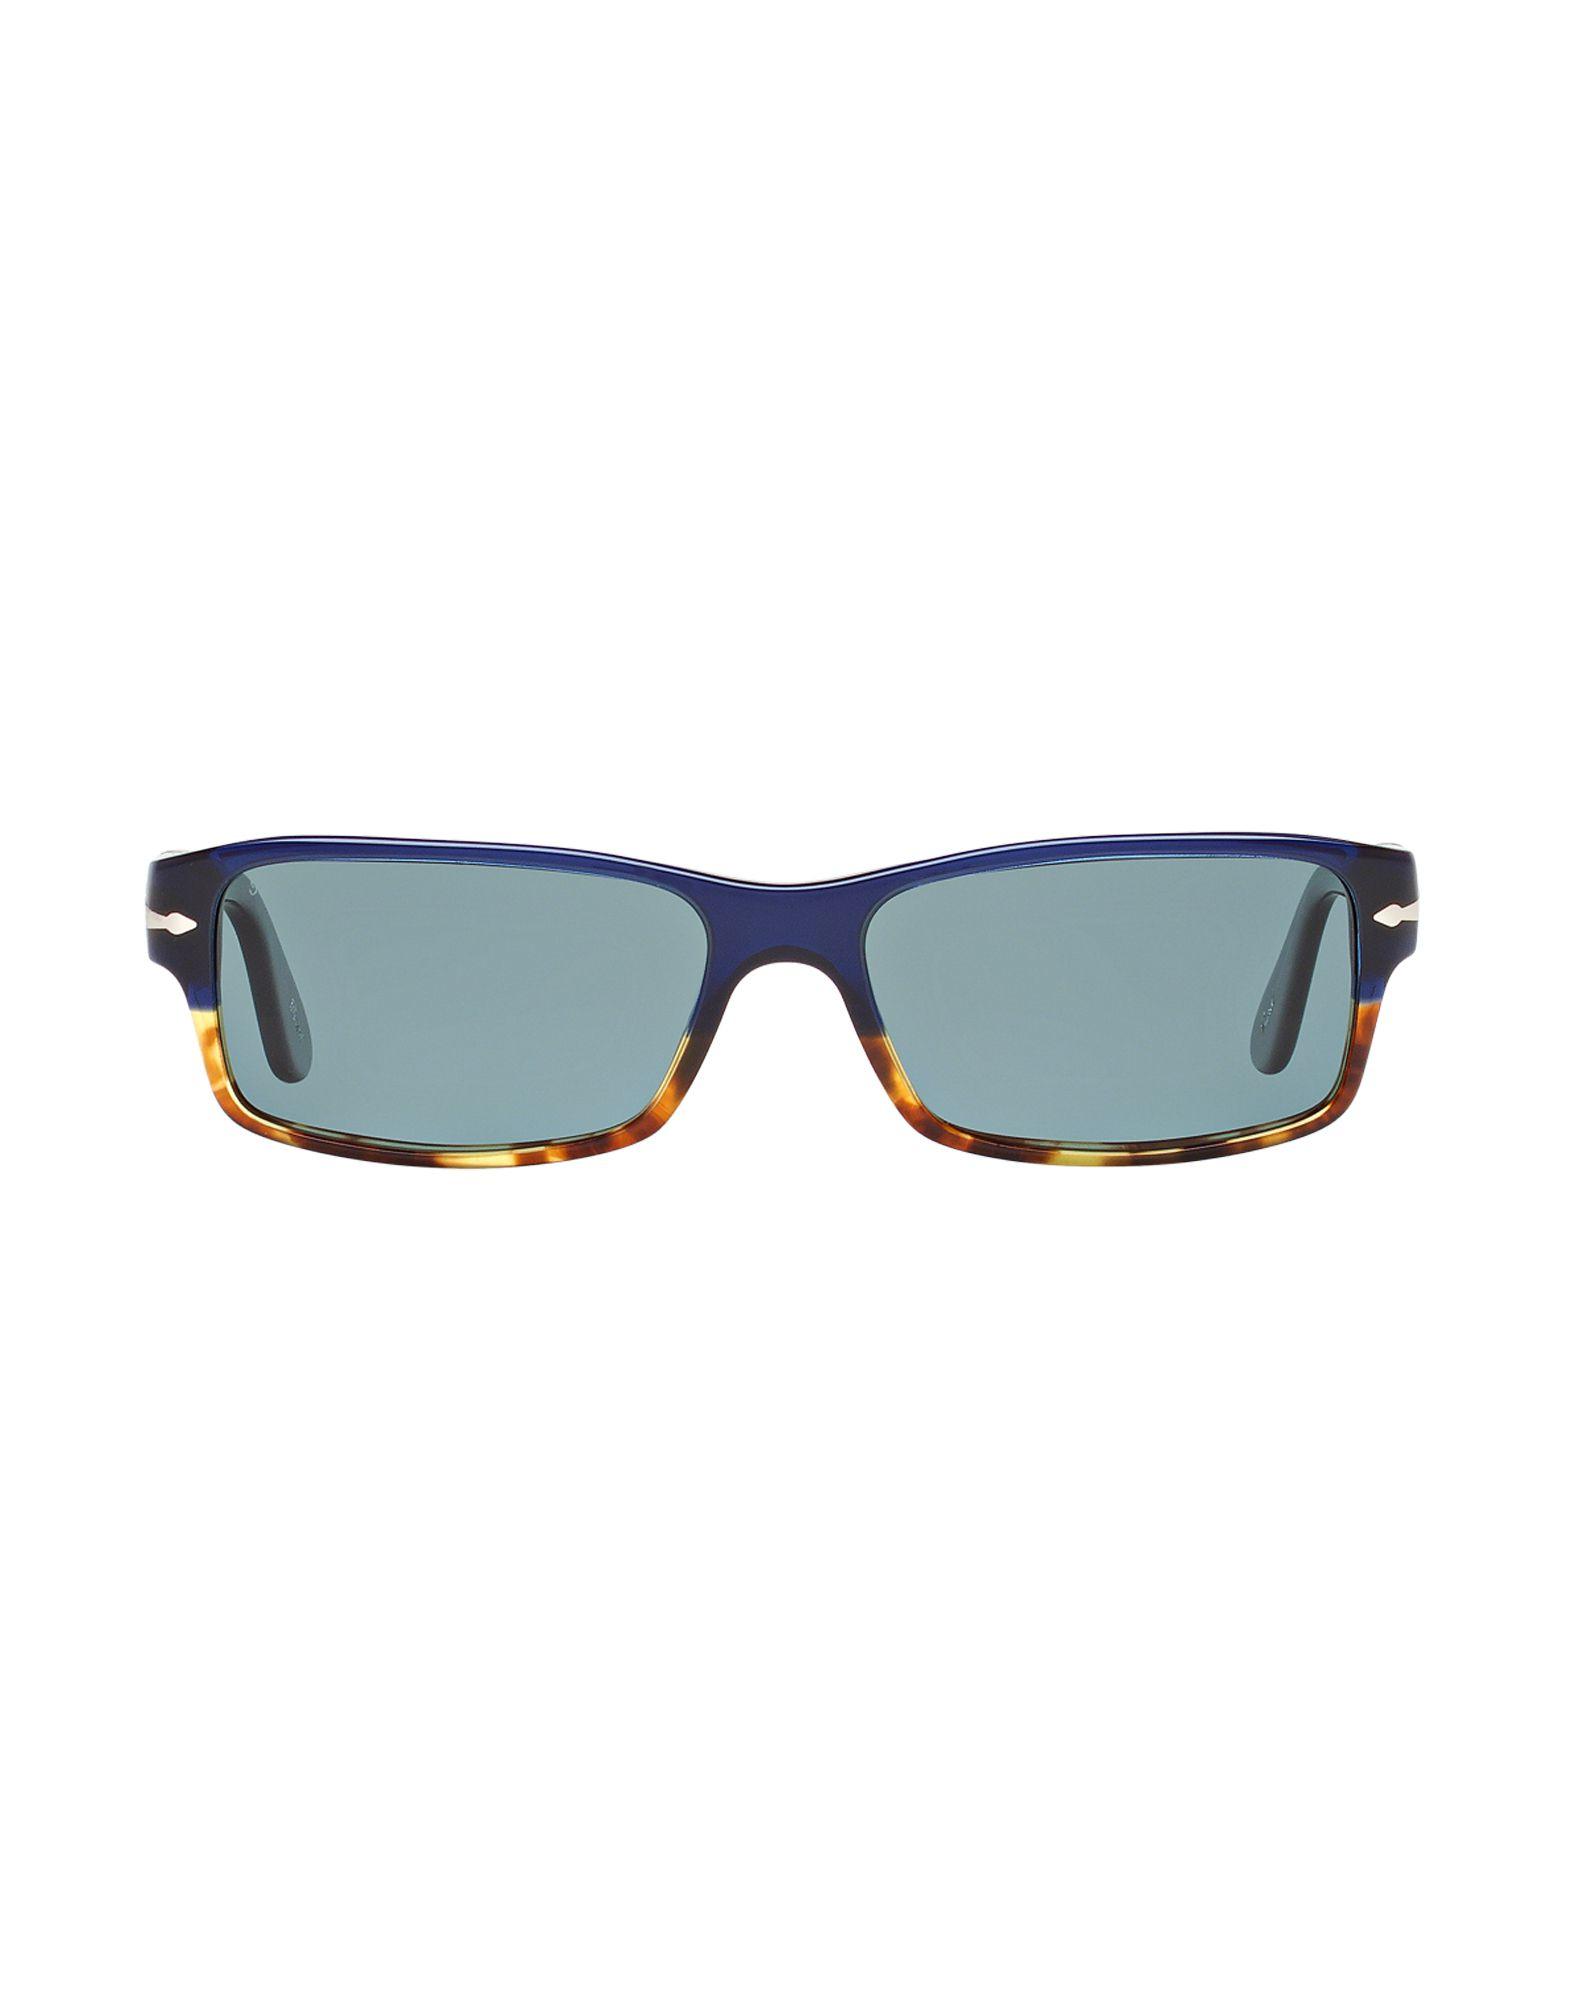 Persol 2958s Sunglasses  persol sunglasses 2017 glasses